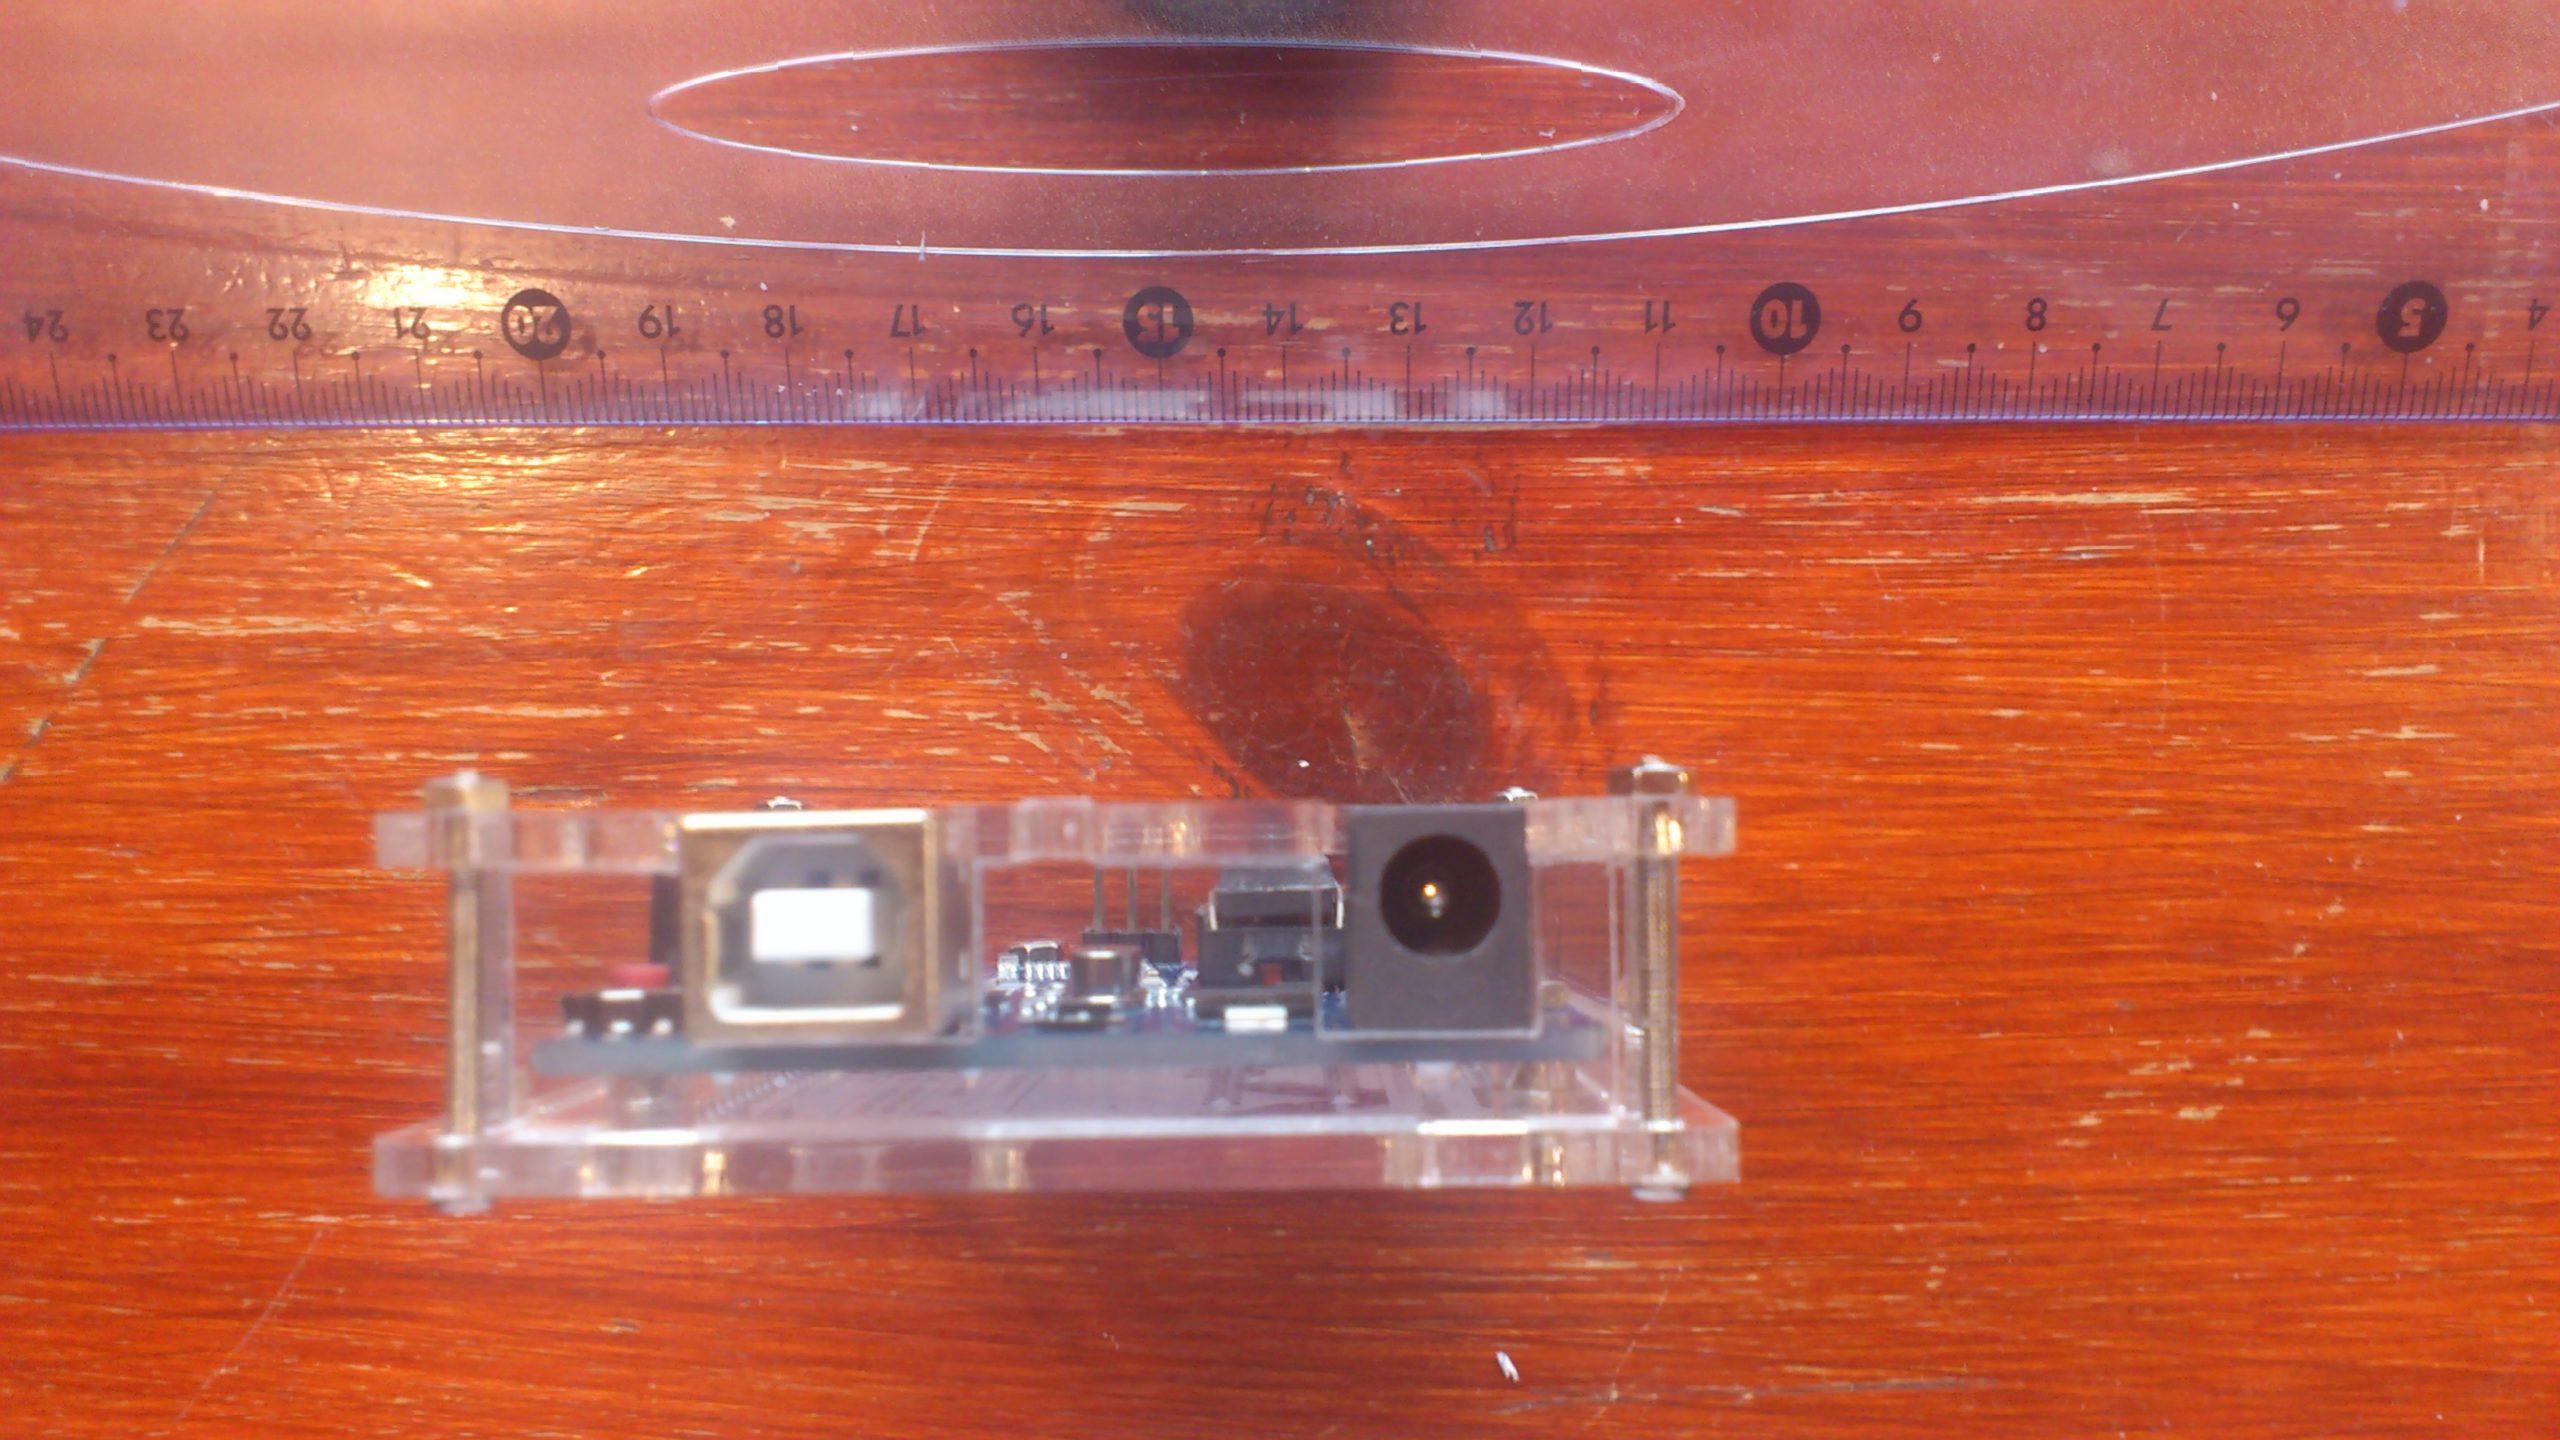 Arduino Uno CAJA Conectores DSC 0048 scaled